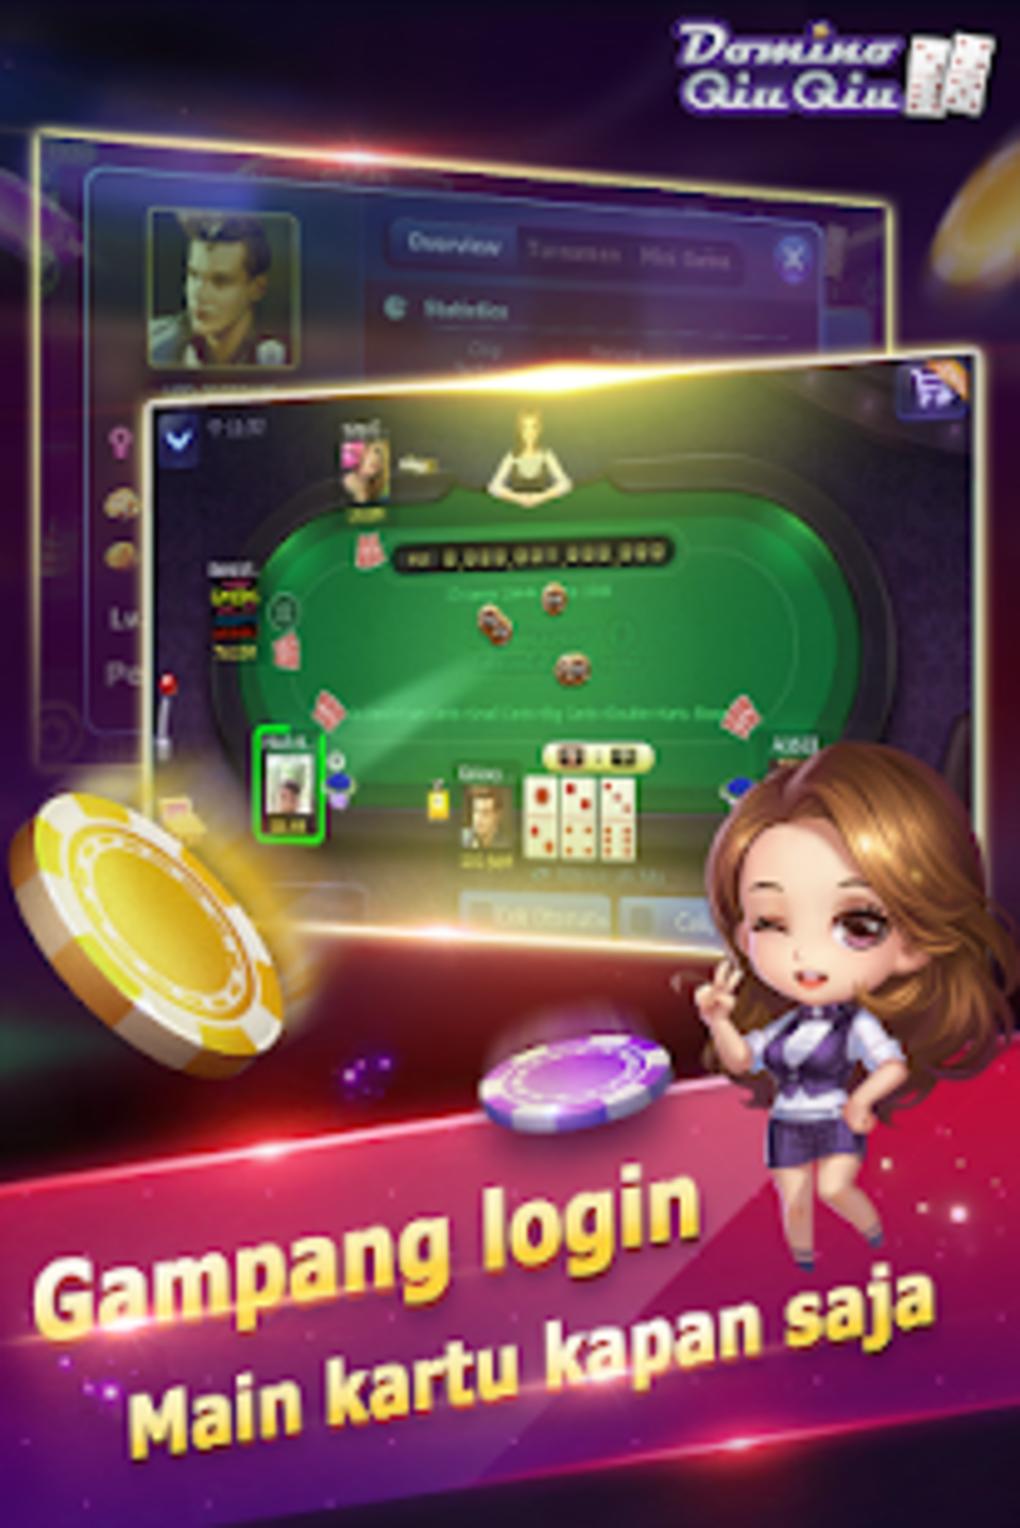 Topfun Domino Qiuqiu Domino99 Kiukiu Apk Untuk Android Unduh